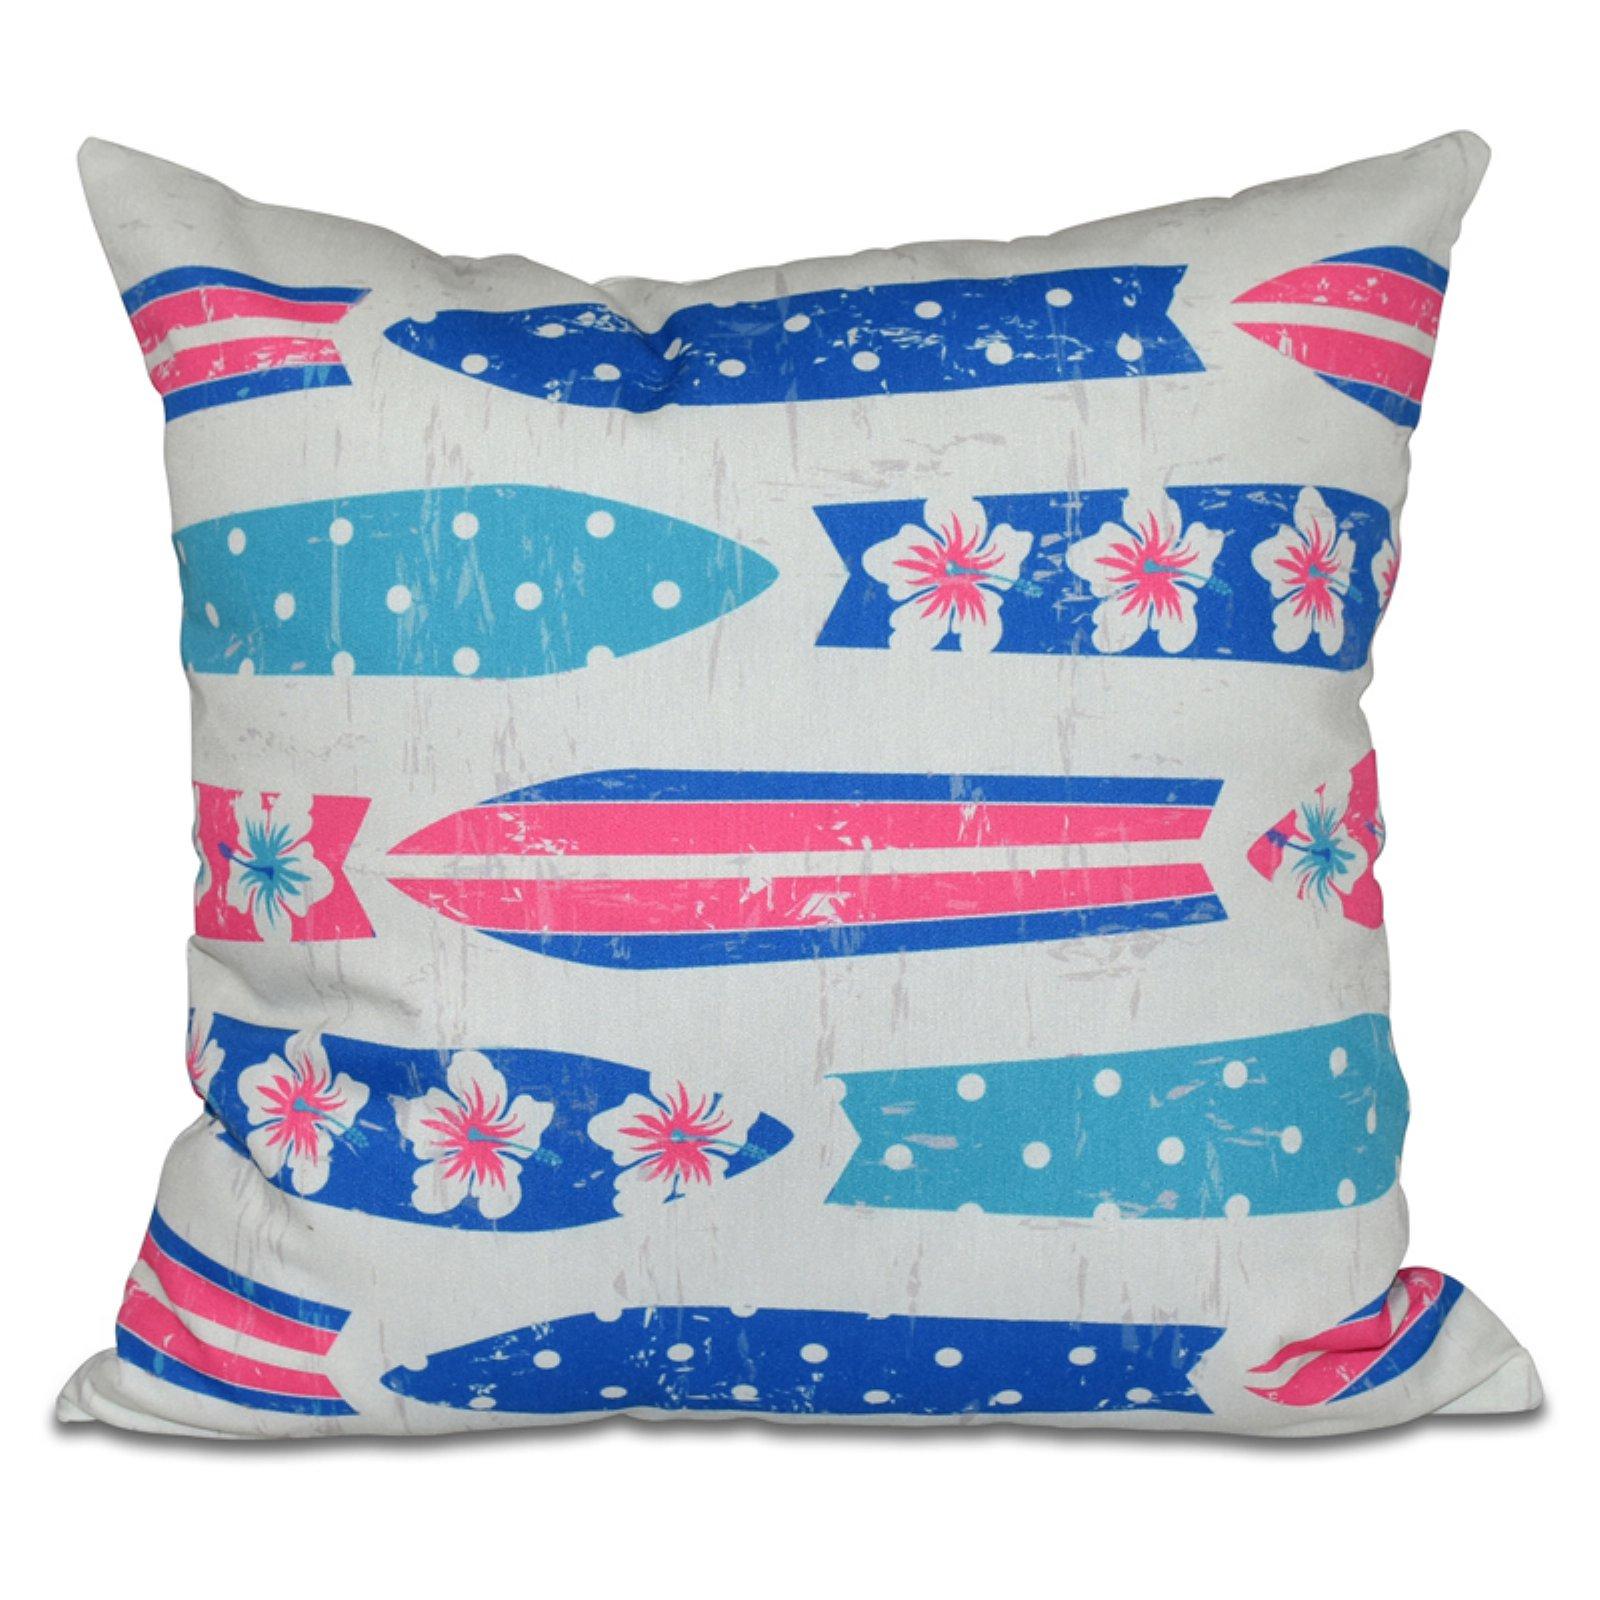 E by Design Hang Ten Dean Square Decorative Pillow